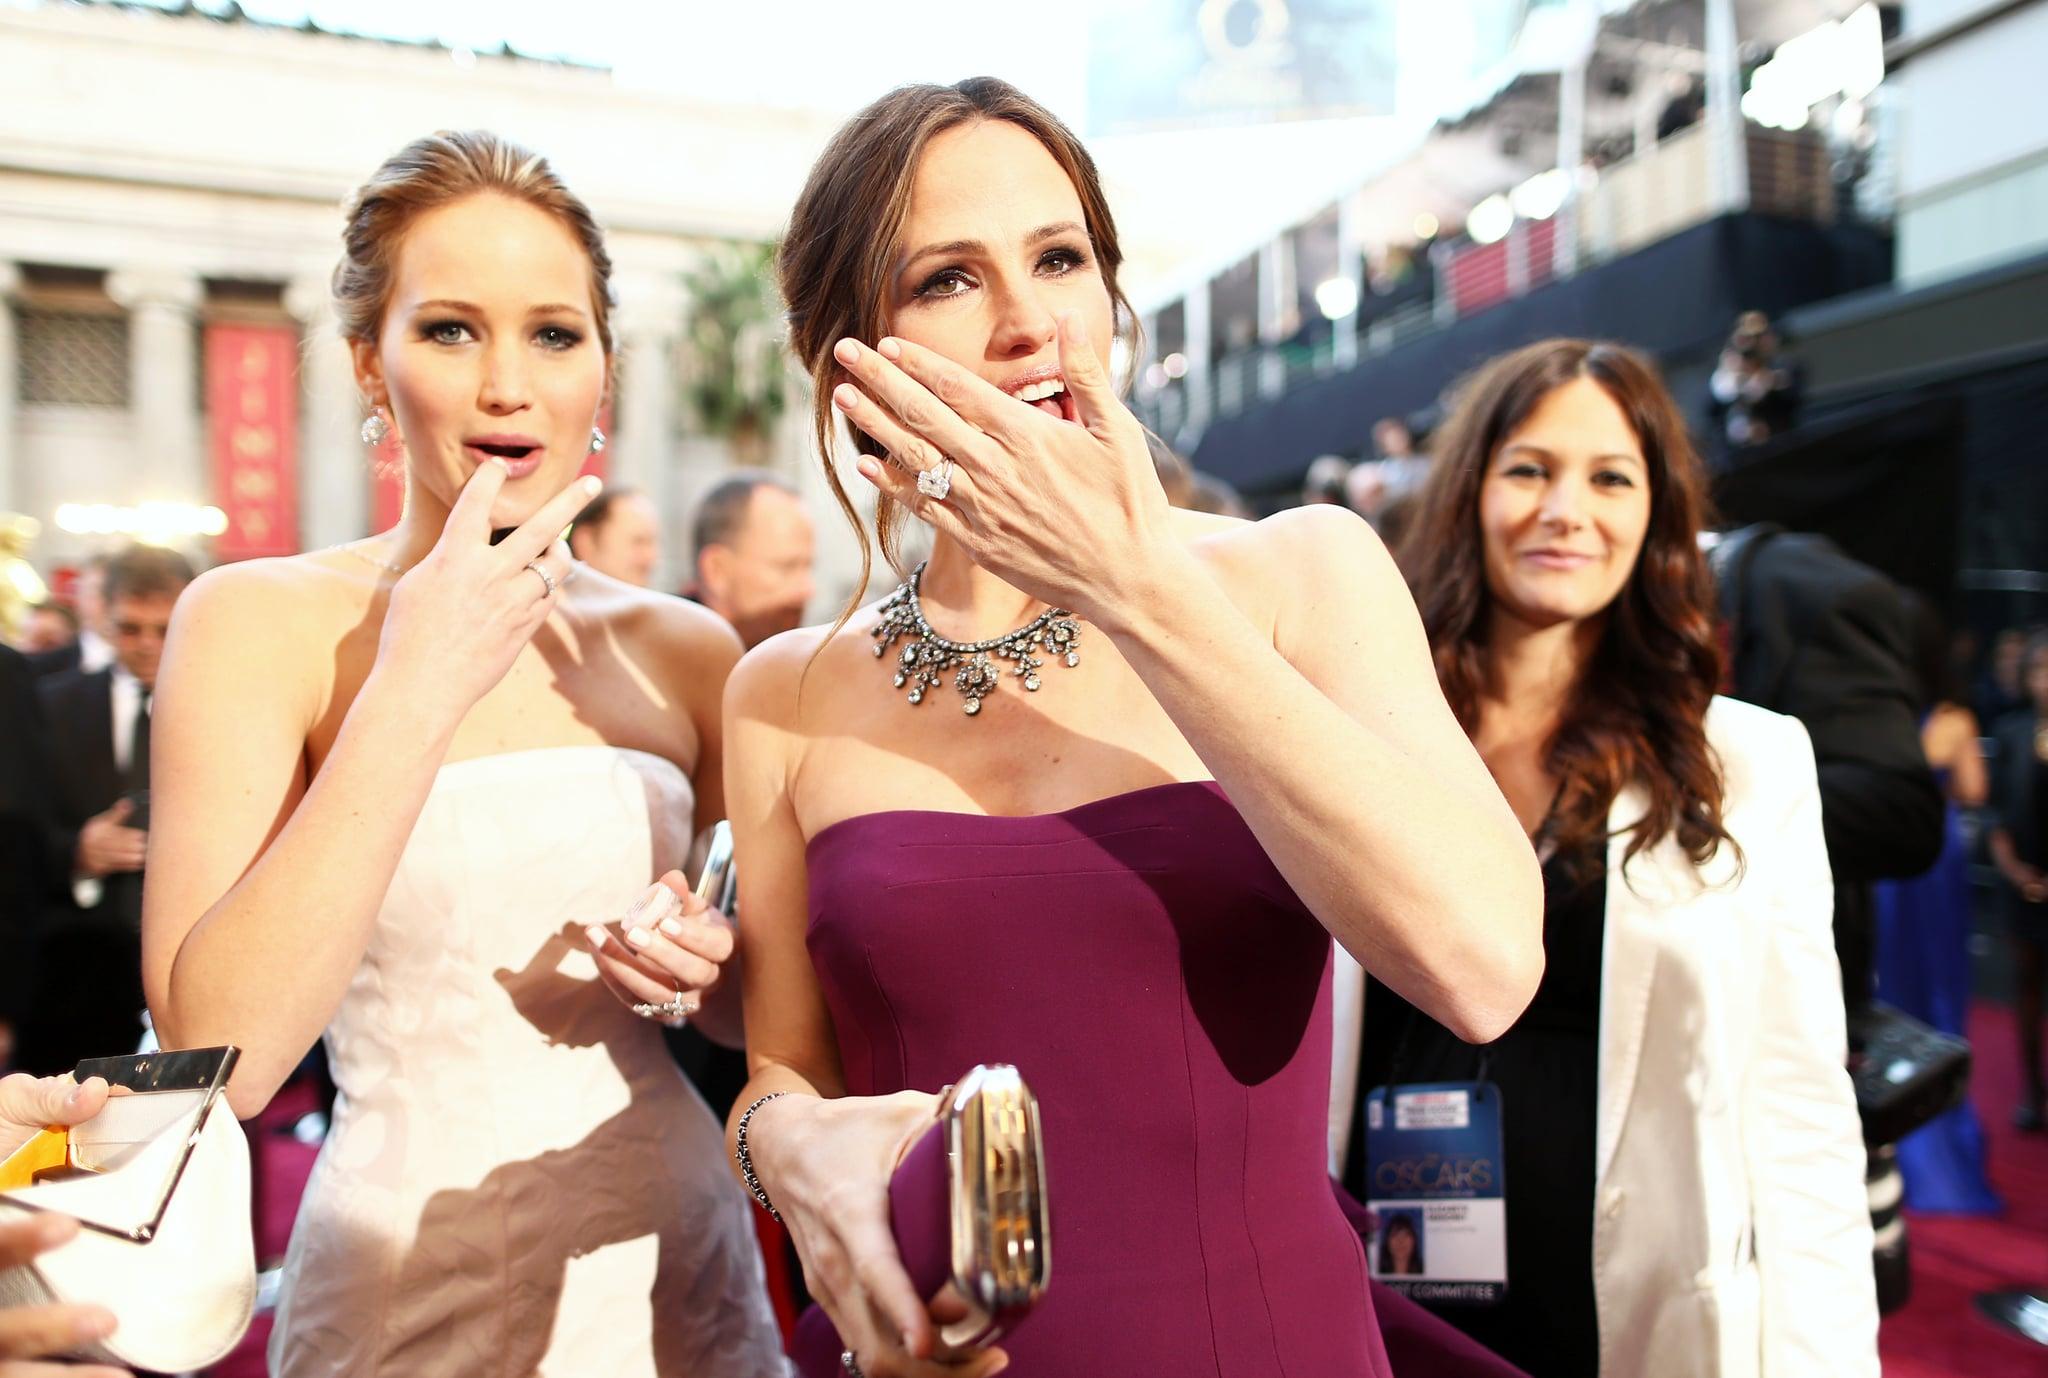 Jennifer Lawrence and Jennifer Garner had a candid moment on the red carpet.